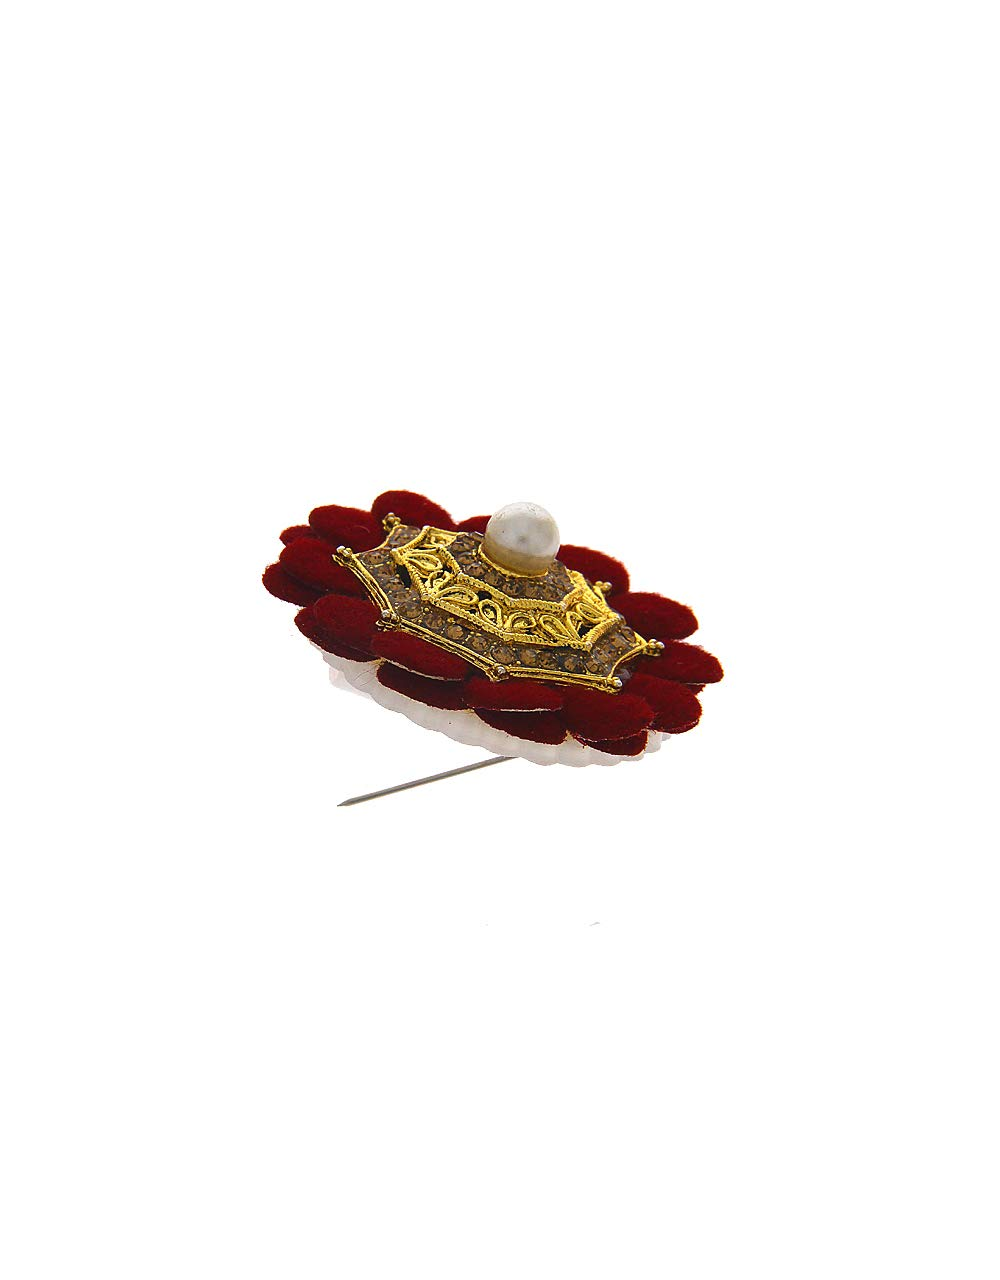 Anuradha Art Maroon Colour Flower Inspired Wonderful Sari/Saree Pin for Women/Girls by Anuradha Art (Image #3)